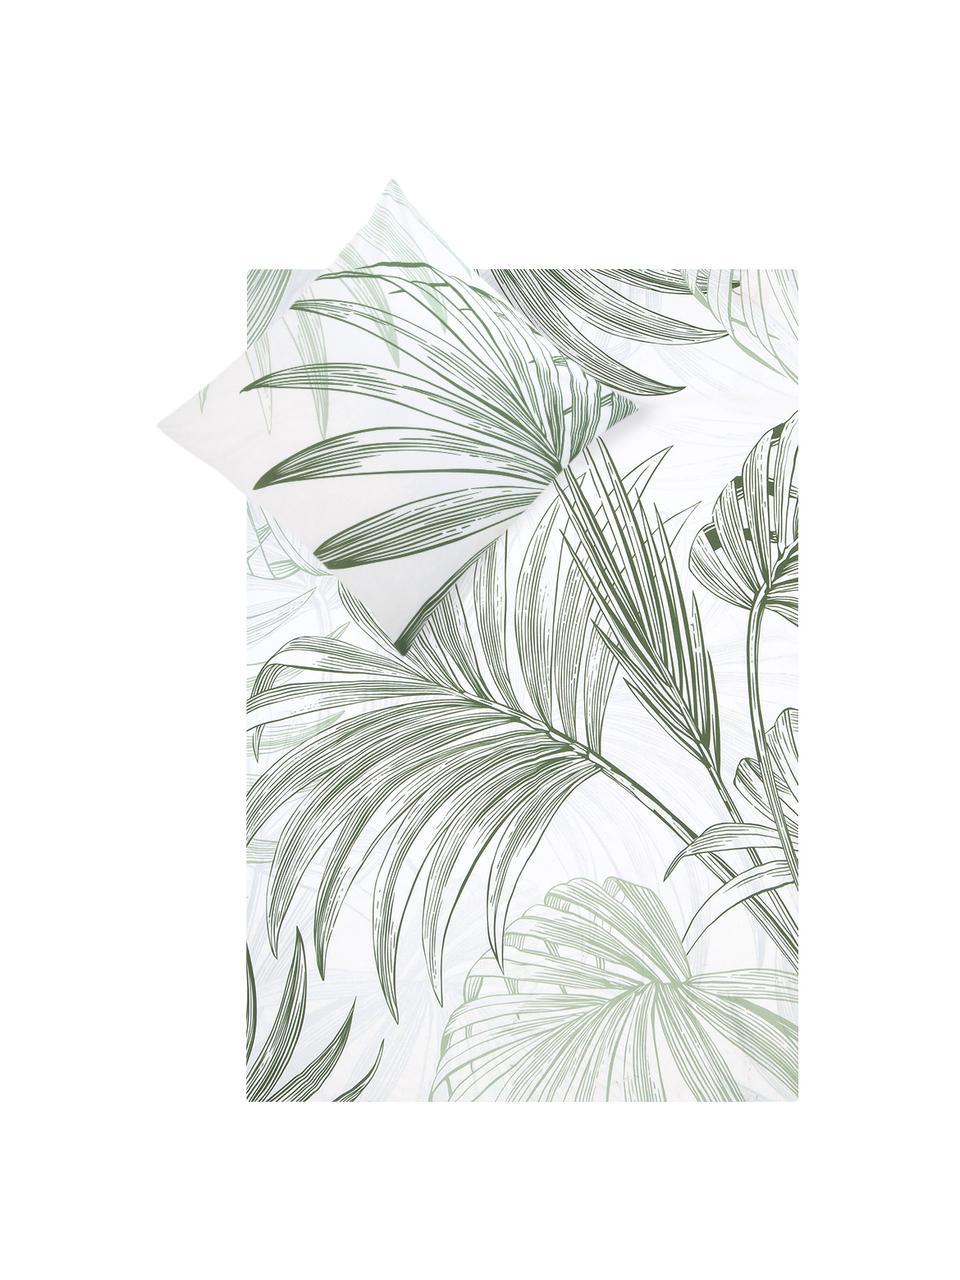 Baumwoll-Bettwäsche Alessa mit Blätterprint, Webart: Renforcé Fadendichte 144 , Weiß, Hellgrün, Dunkelgrün, 135 x 200 cm + 1 Kissen 80 x 80 cm